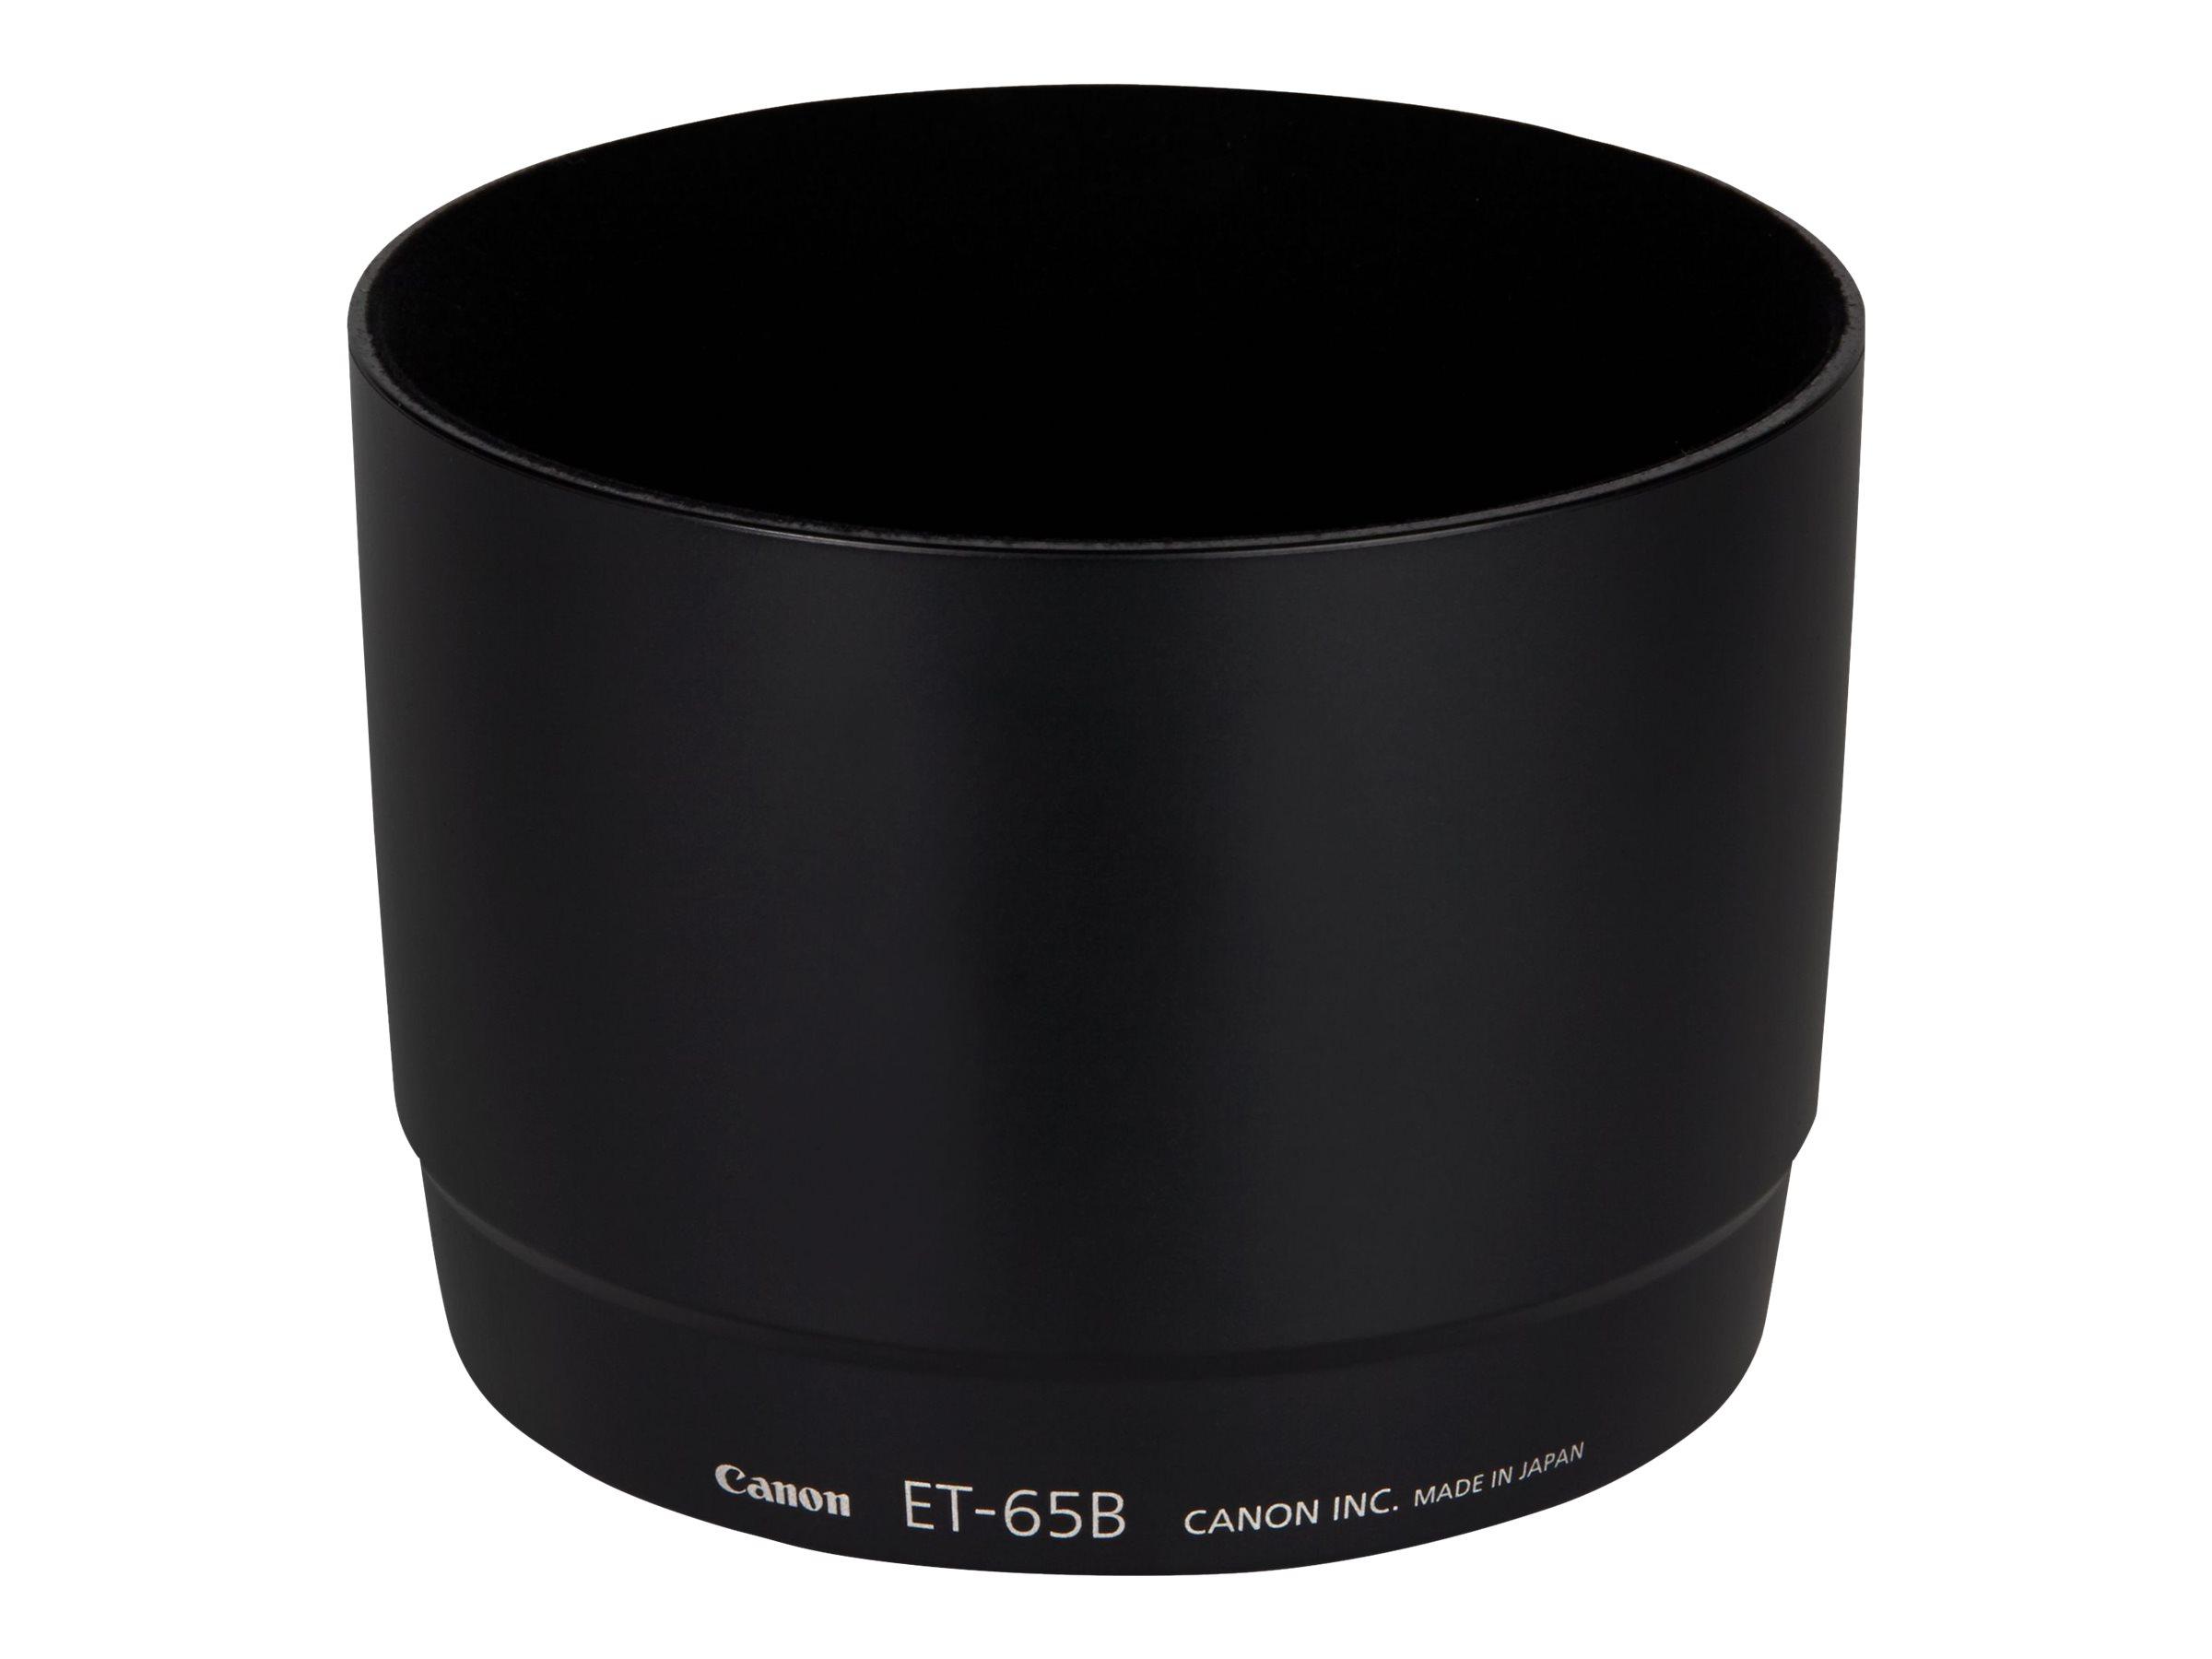 Canon ET-65B - Gegenlichtblende - für P/N: 0345B010AA, 0345B014, 0345B014AA, 4426B002, 9321A006AA, 9321A014AA, EF70-300ISUS